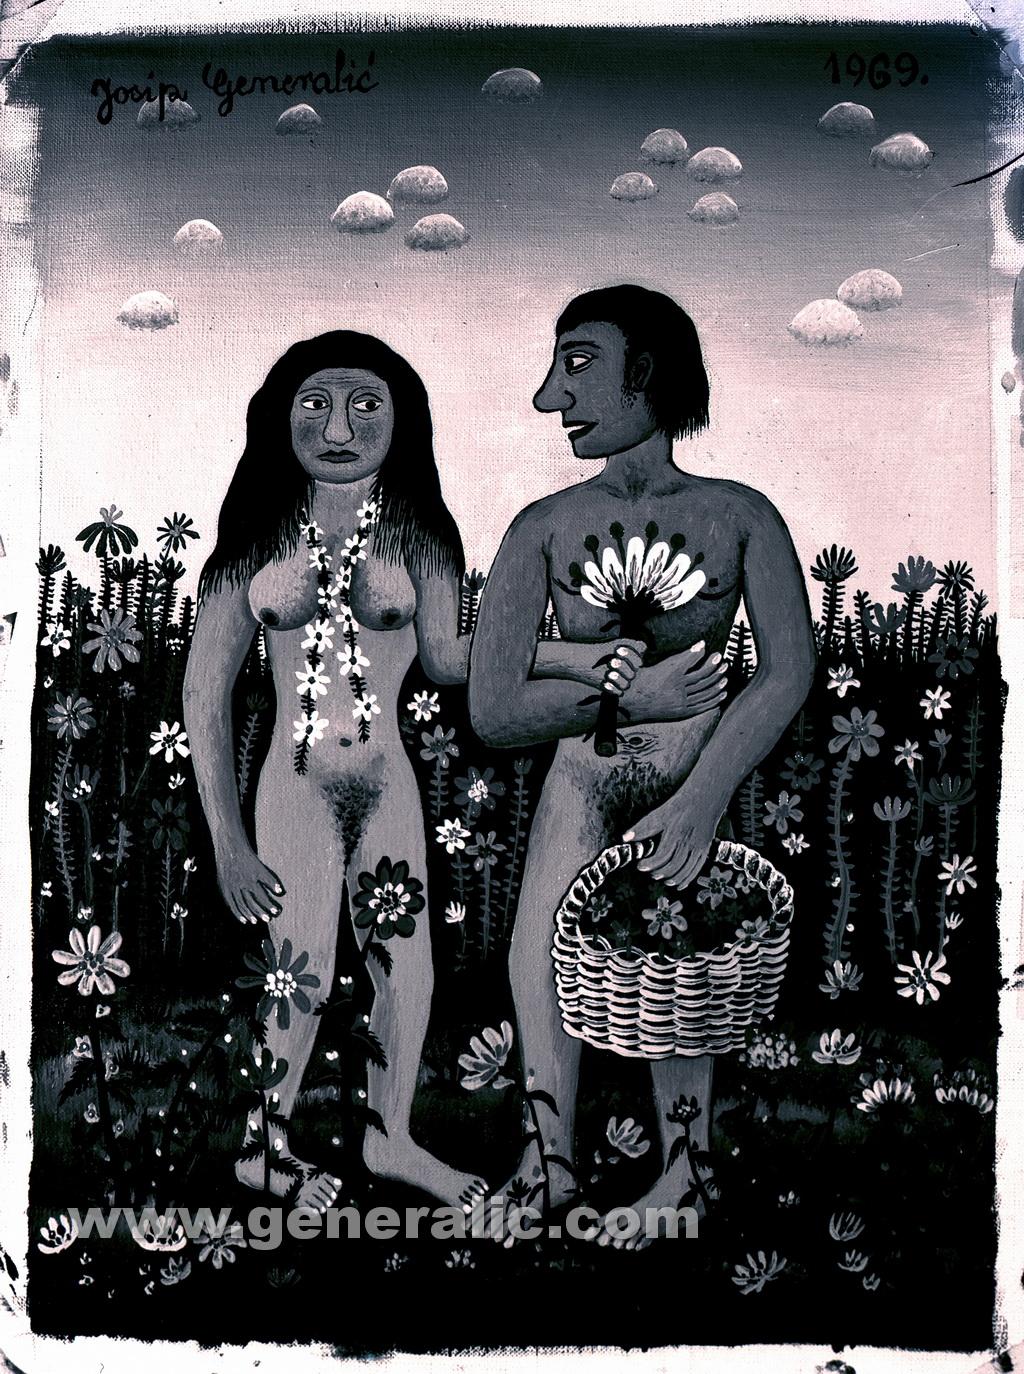 Josip Generalic, 1969, Adam and Eve, oil on canvas